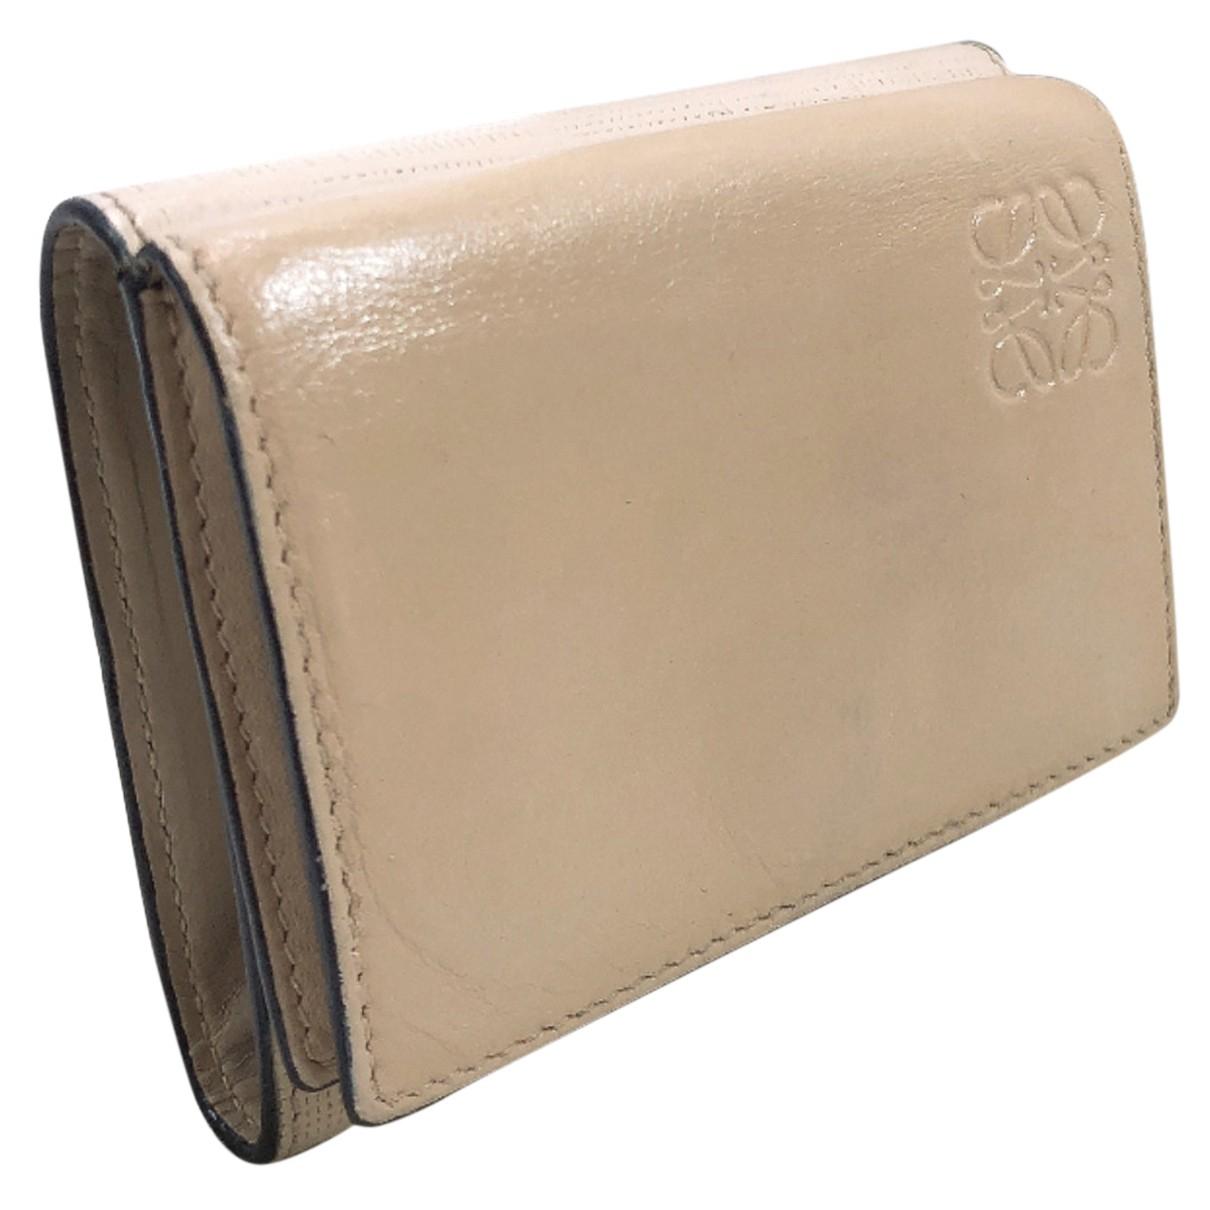 Loewe - Portefeuille   pour femme en cuir - beige